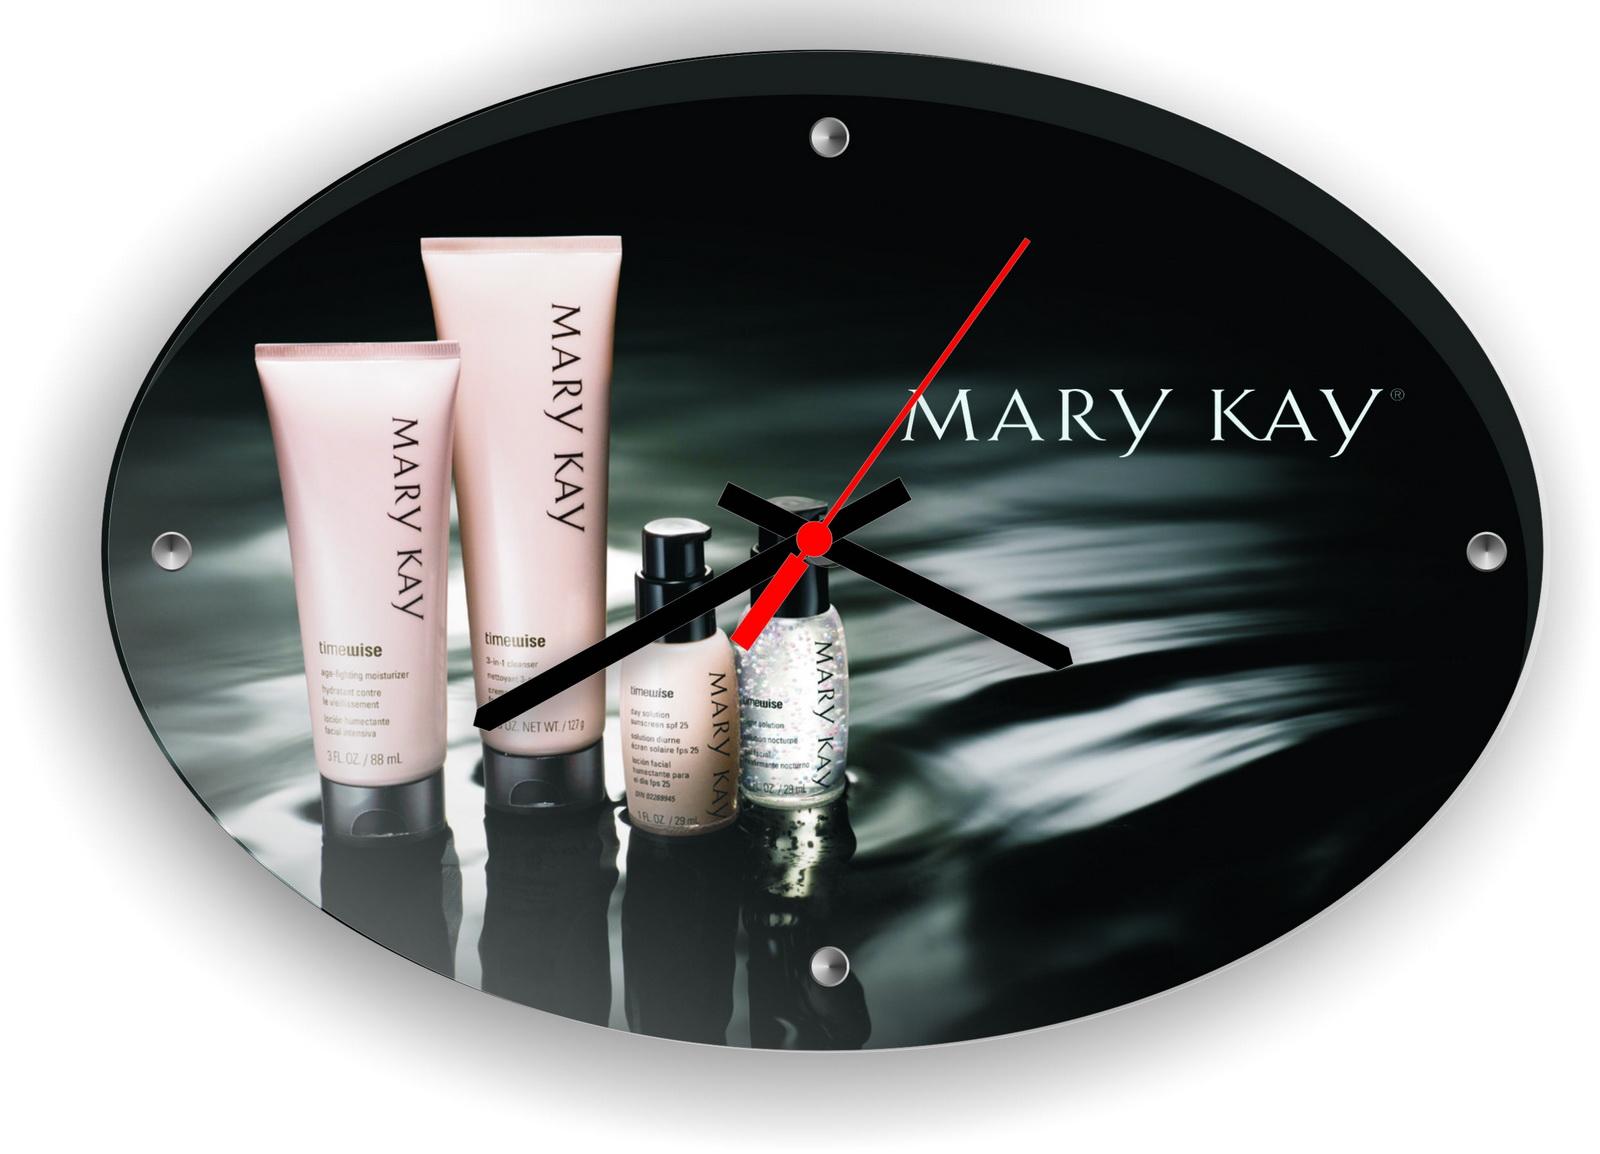 Часы с логотипом Mary Kay